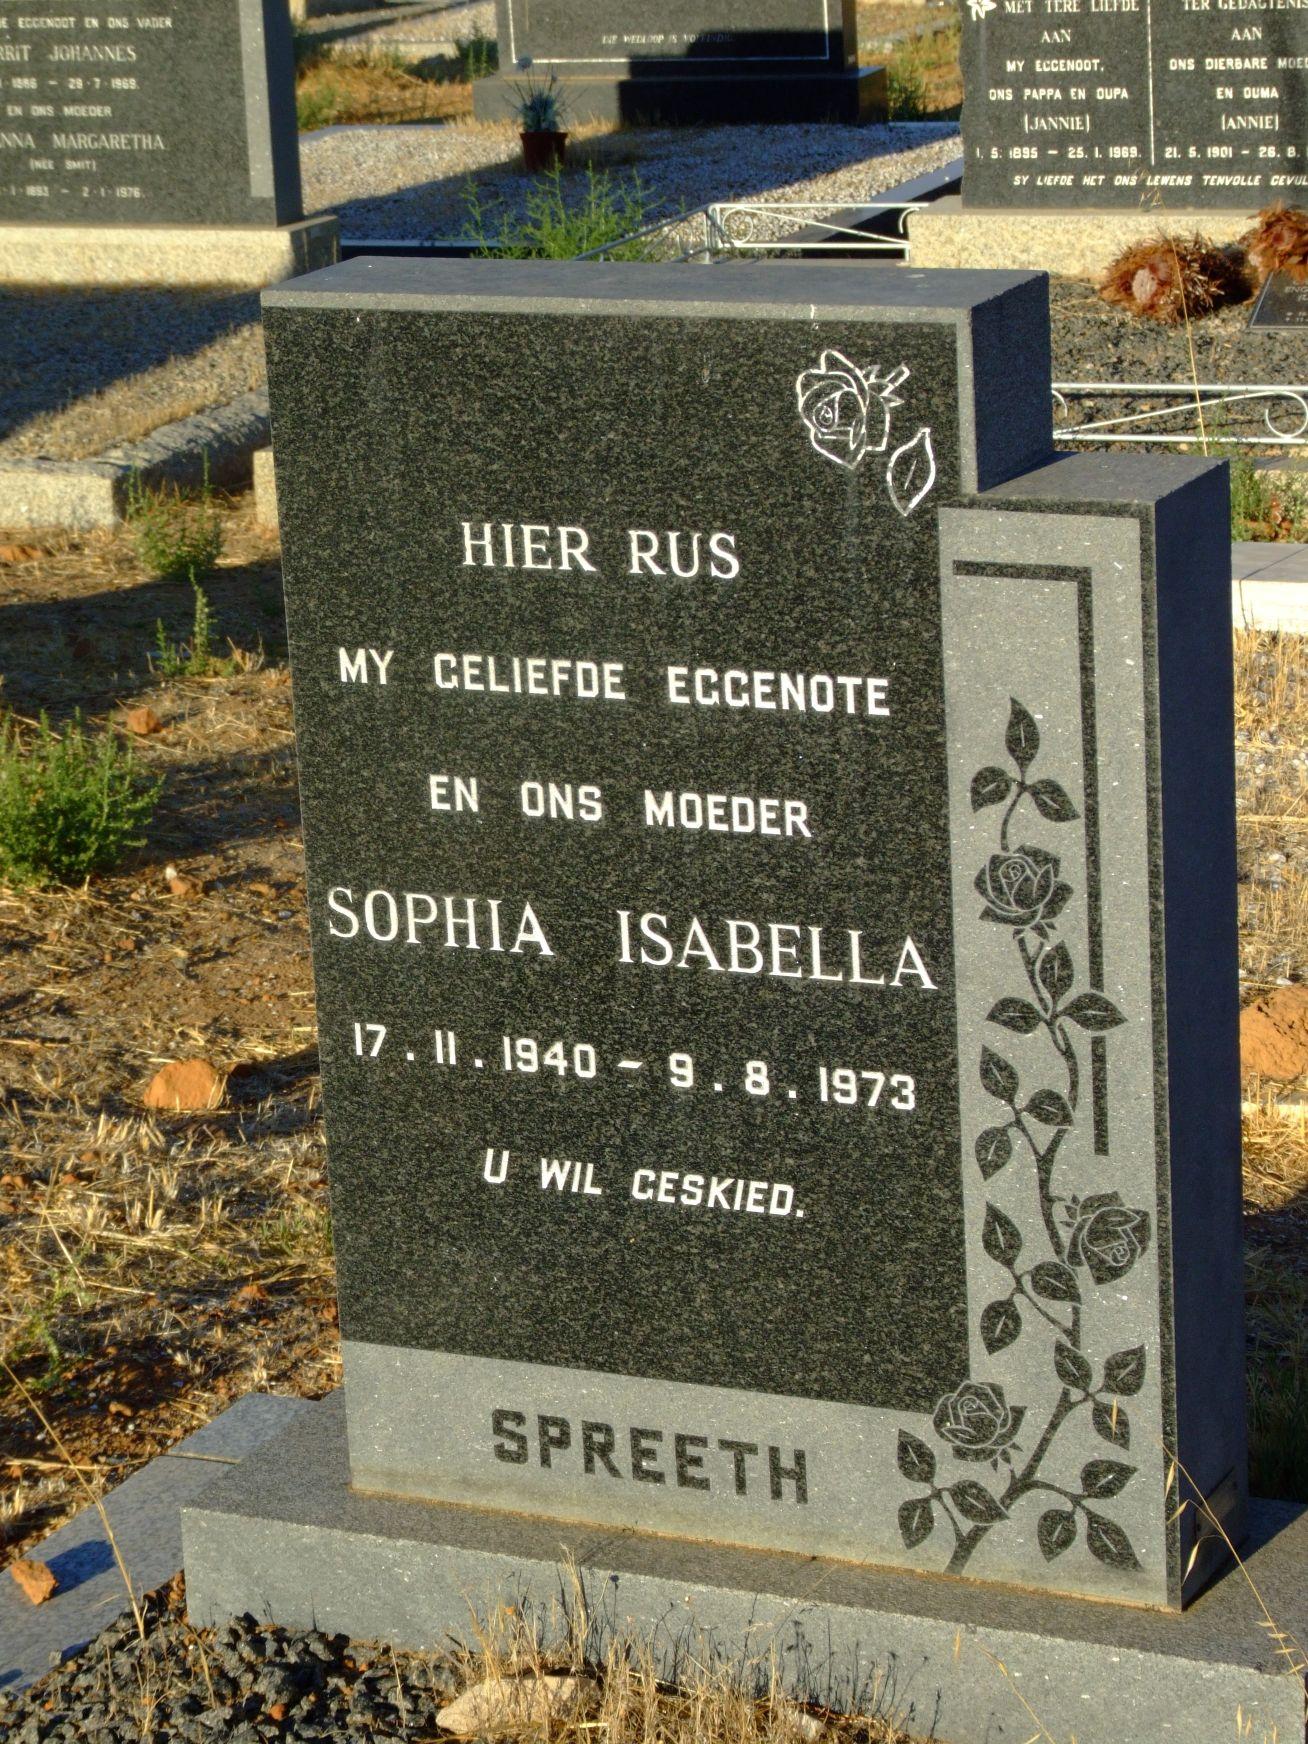 Spreeth, Sophia Isabella